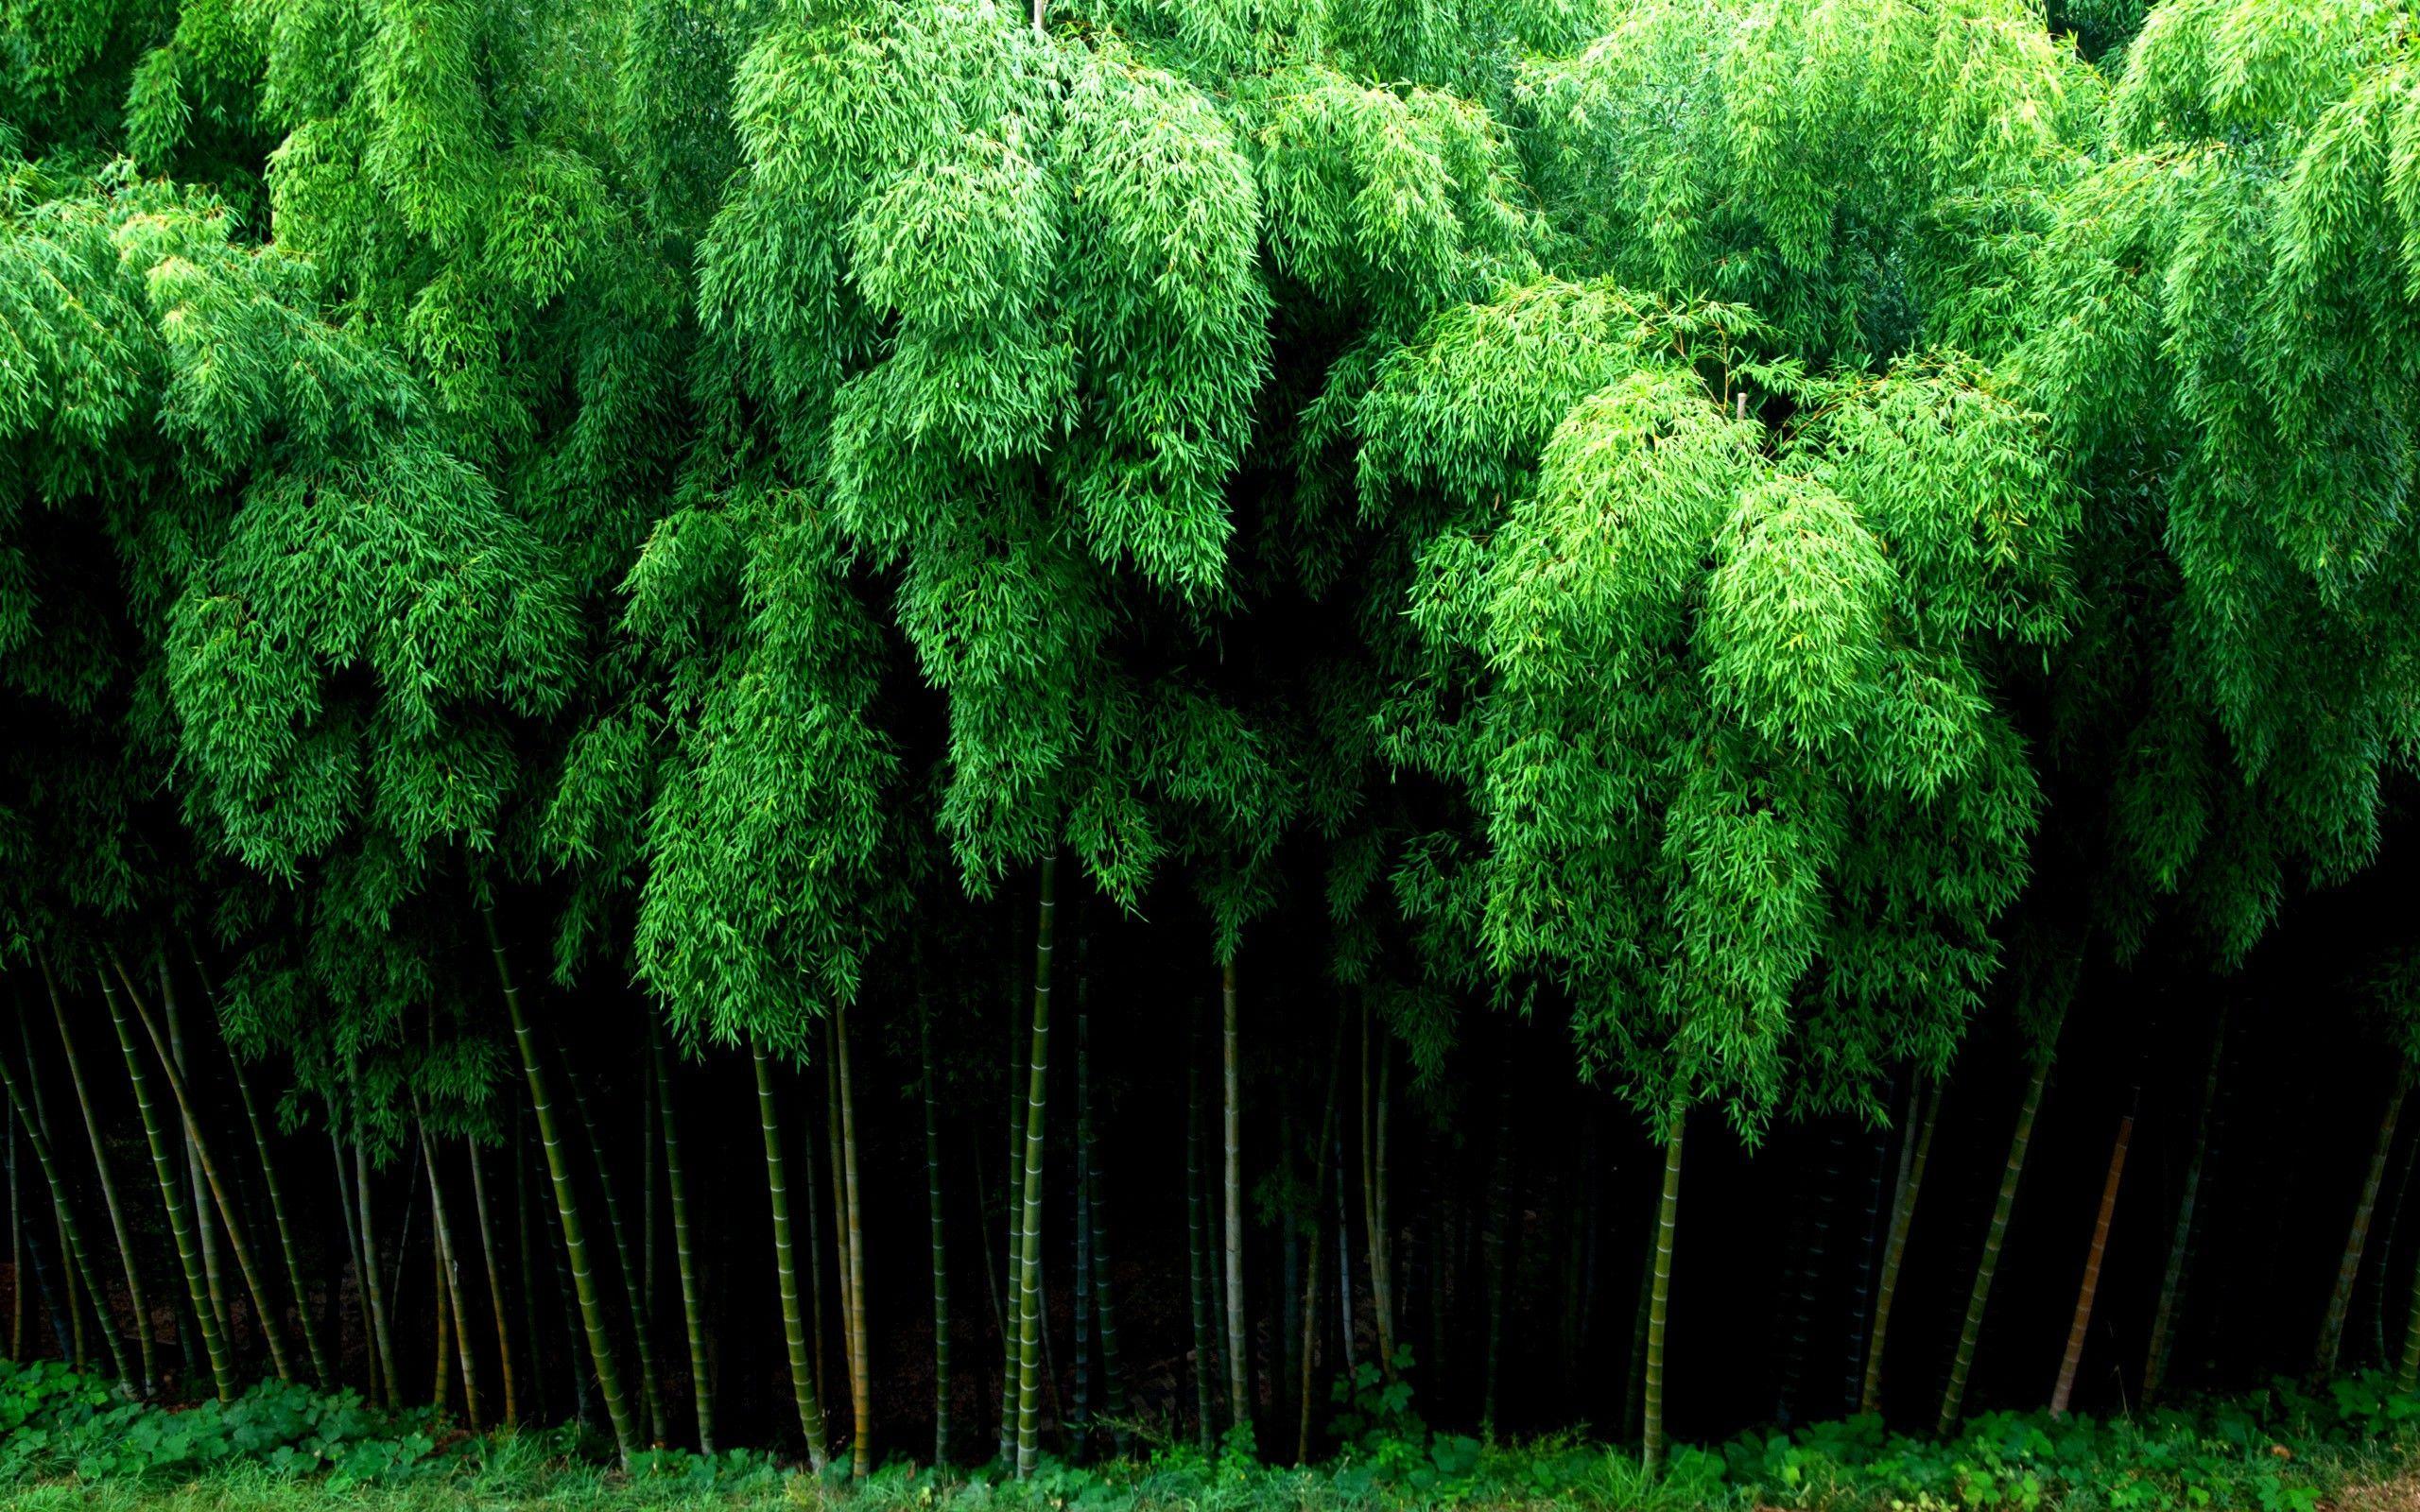 Bamboo Wallpaper Image Group